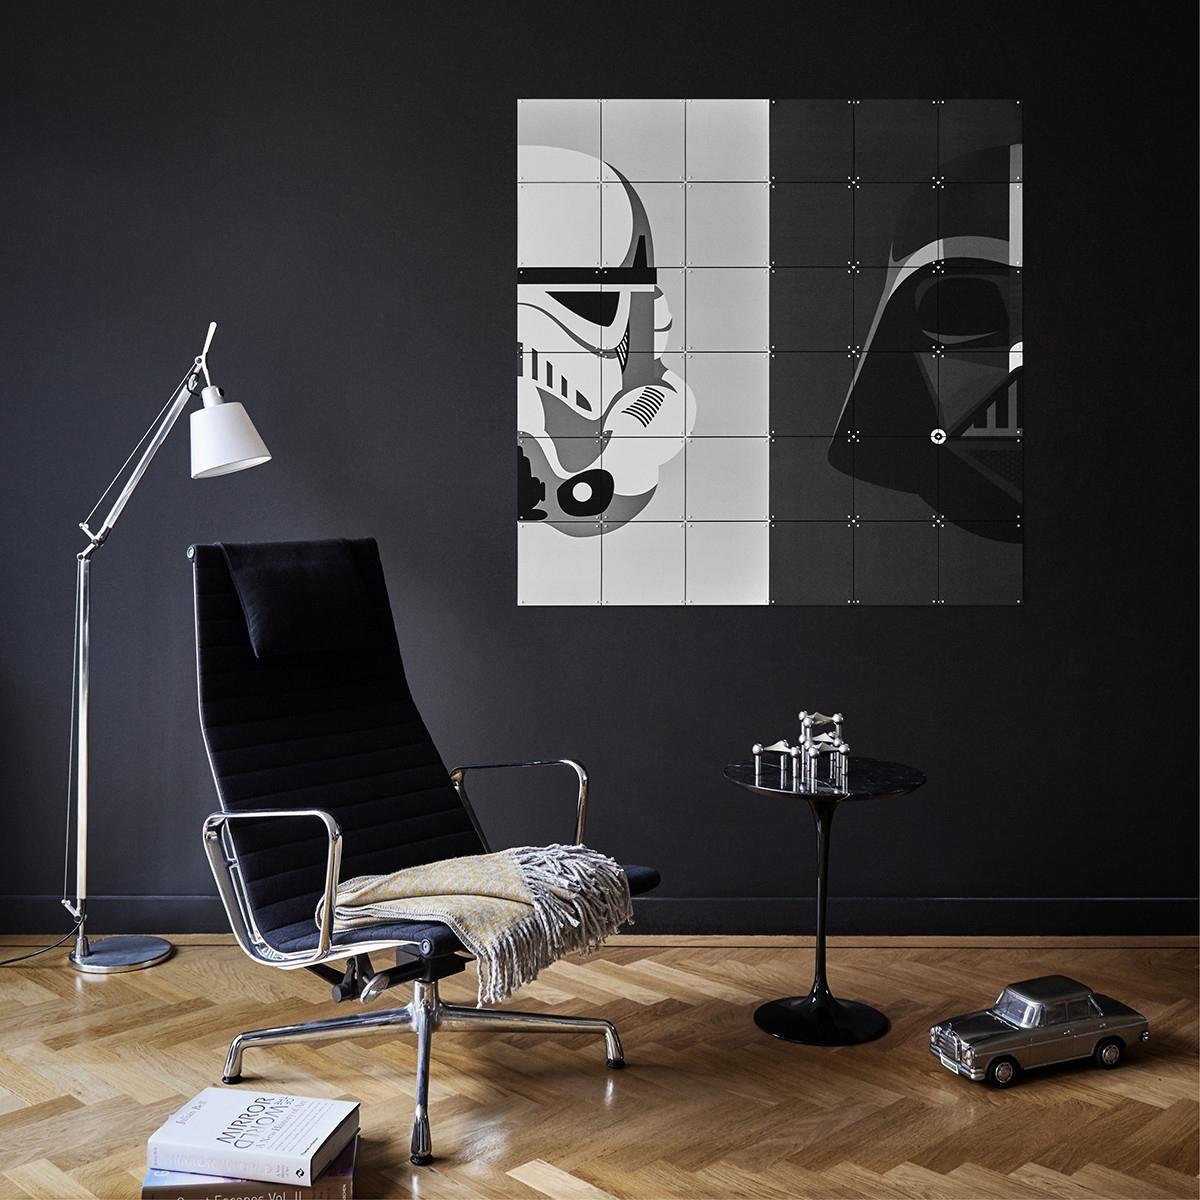 Star Wars Stormtrooper/darth Vader Wall Art Panels – Tgi Found It With Recent Star Wars Wall Art (Gallery 14 of 15)